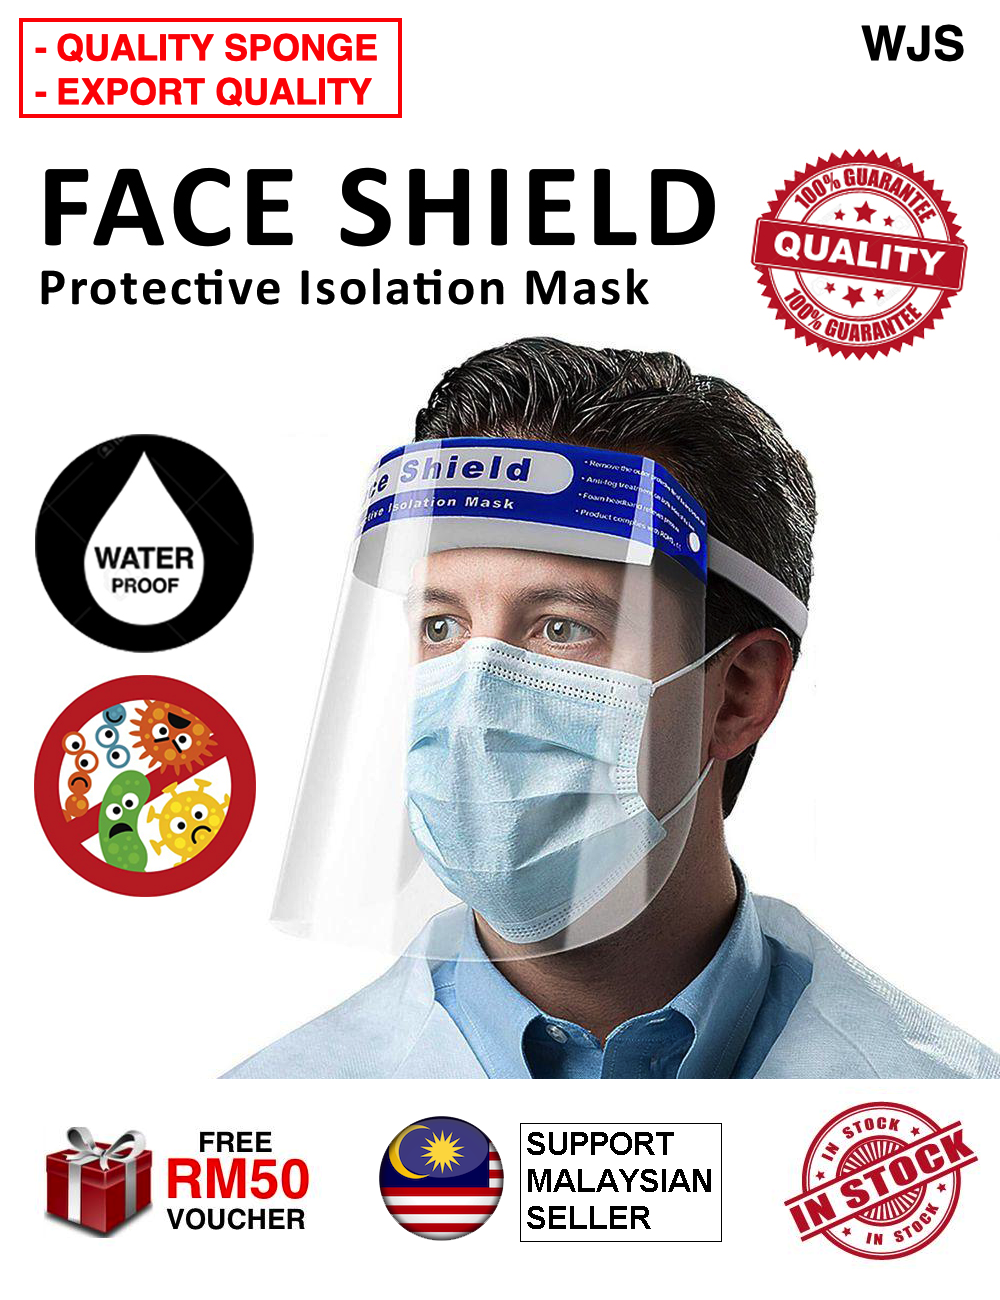 (EXTRA COMFORT) WJS Premium Face Shield PVC Face Shield Transparent Material Waterproof Anti-fog Sneeze Headgear Masks Foldable Protective Face Full Face Protection Shield Mask Hats Face Mask [FREE RM 50 VOUCHER]